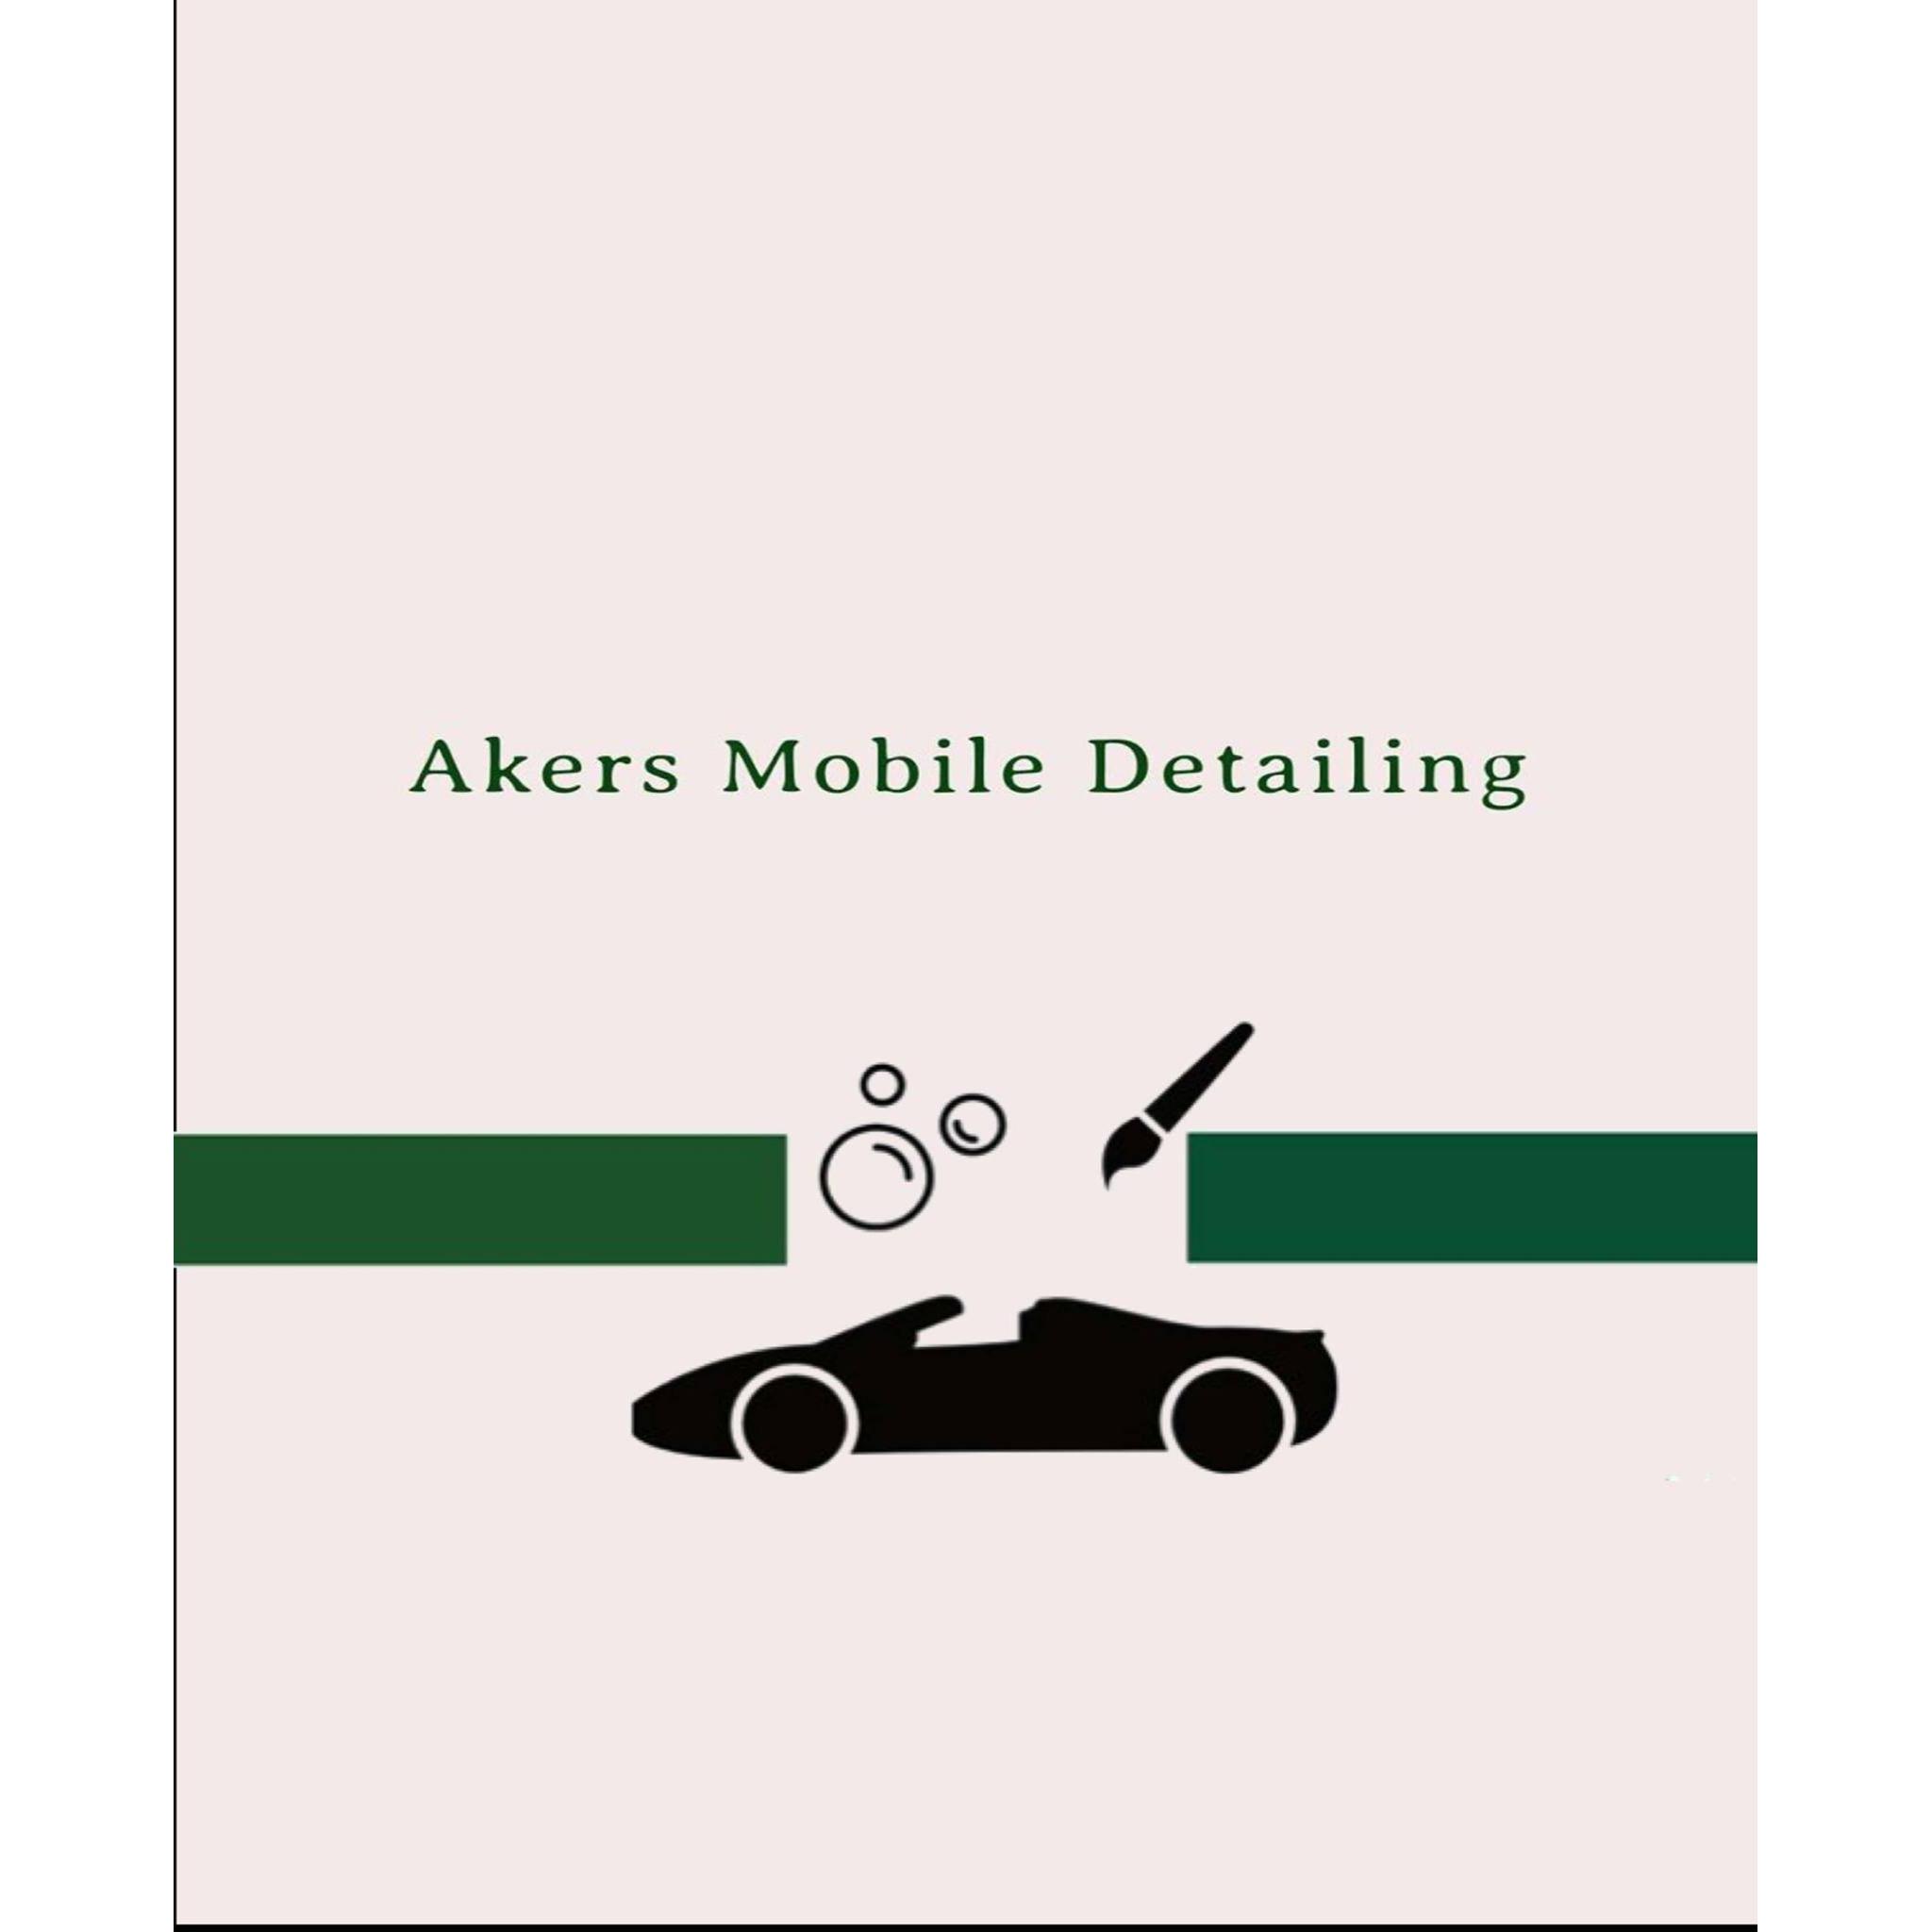 Akers Mobile Detailing